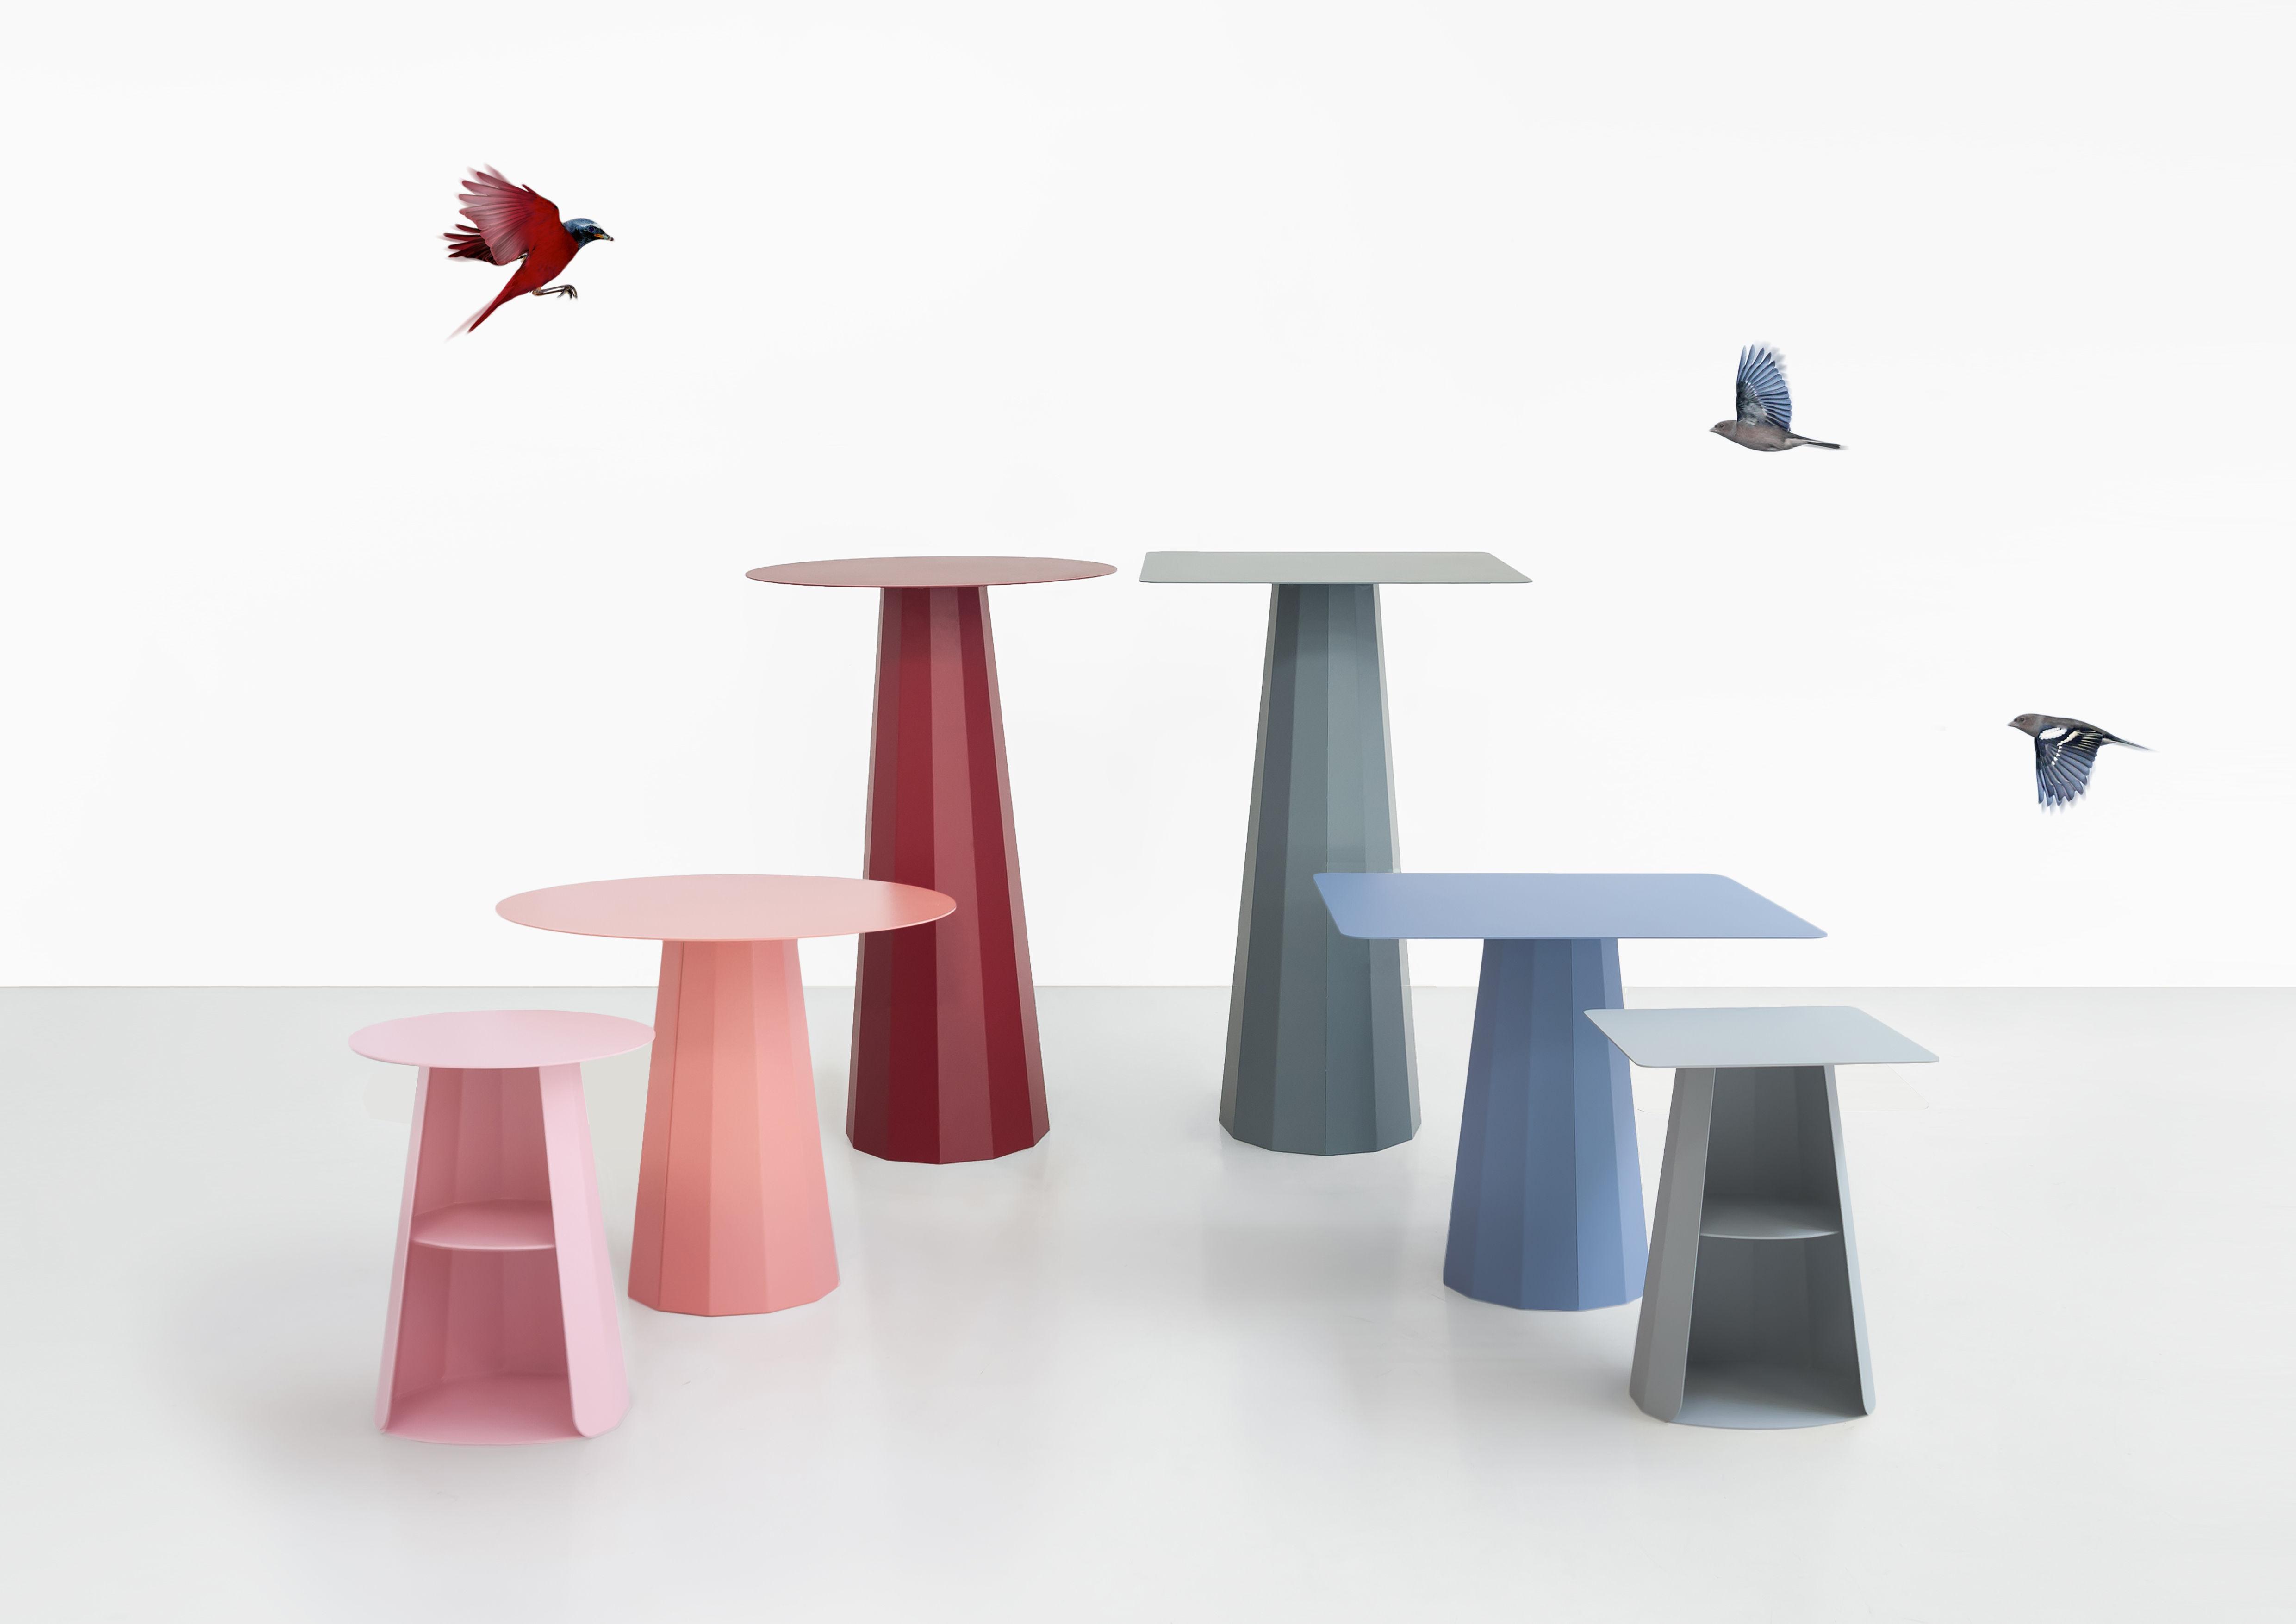 table d 39 appoint ankara 39 x h 50 cm rose clair. Black Bedroom Furniture Sets. Home Design Ideas